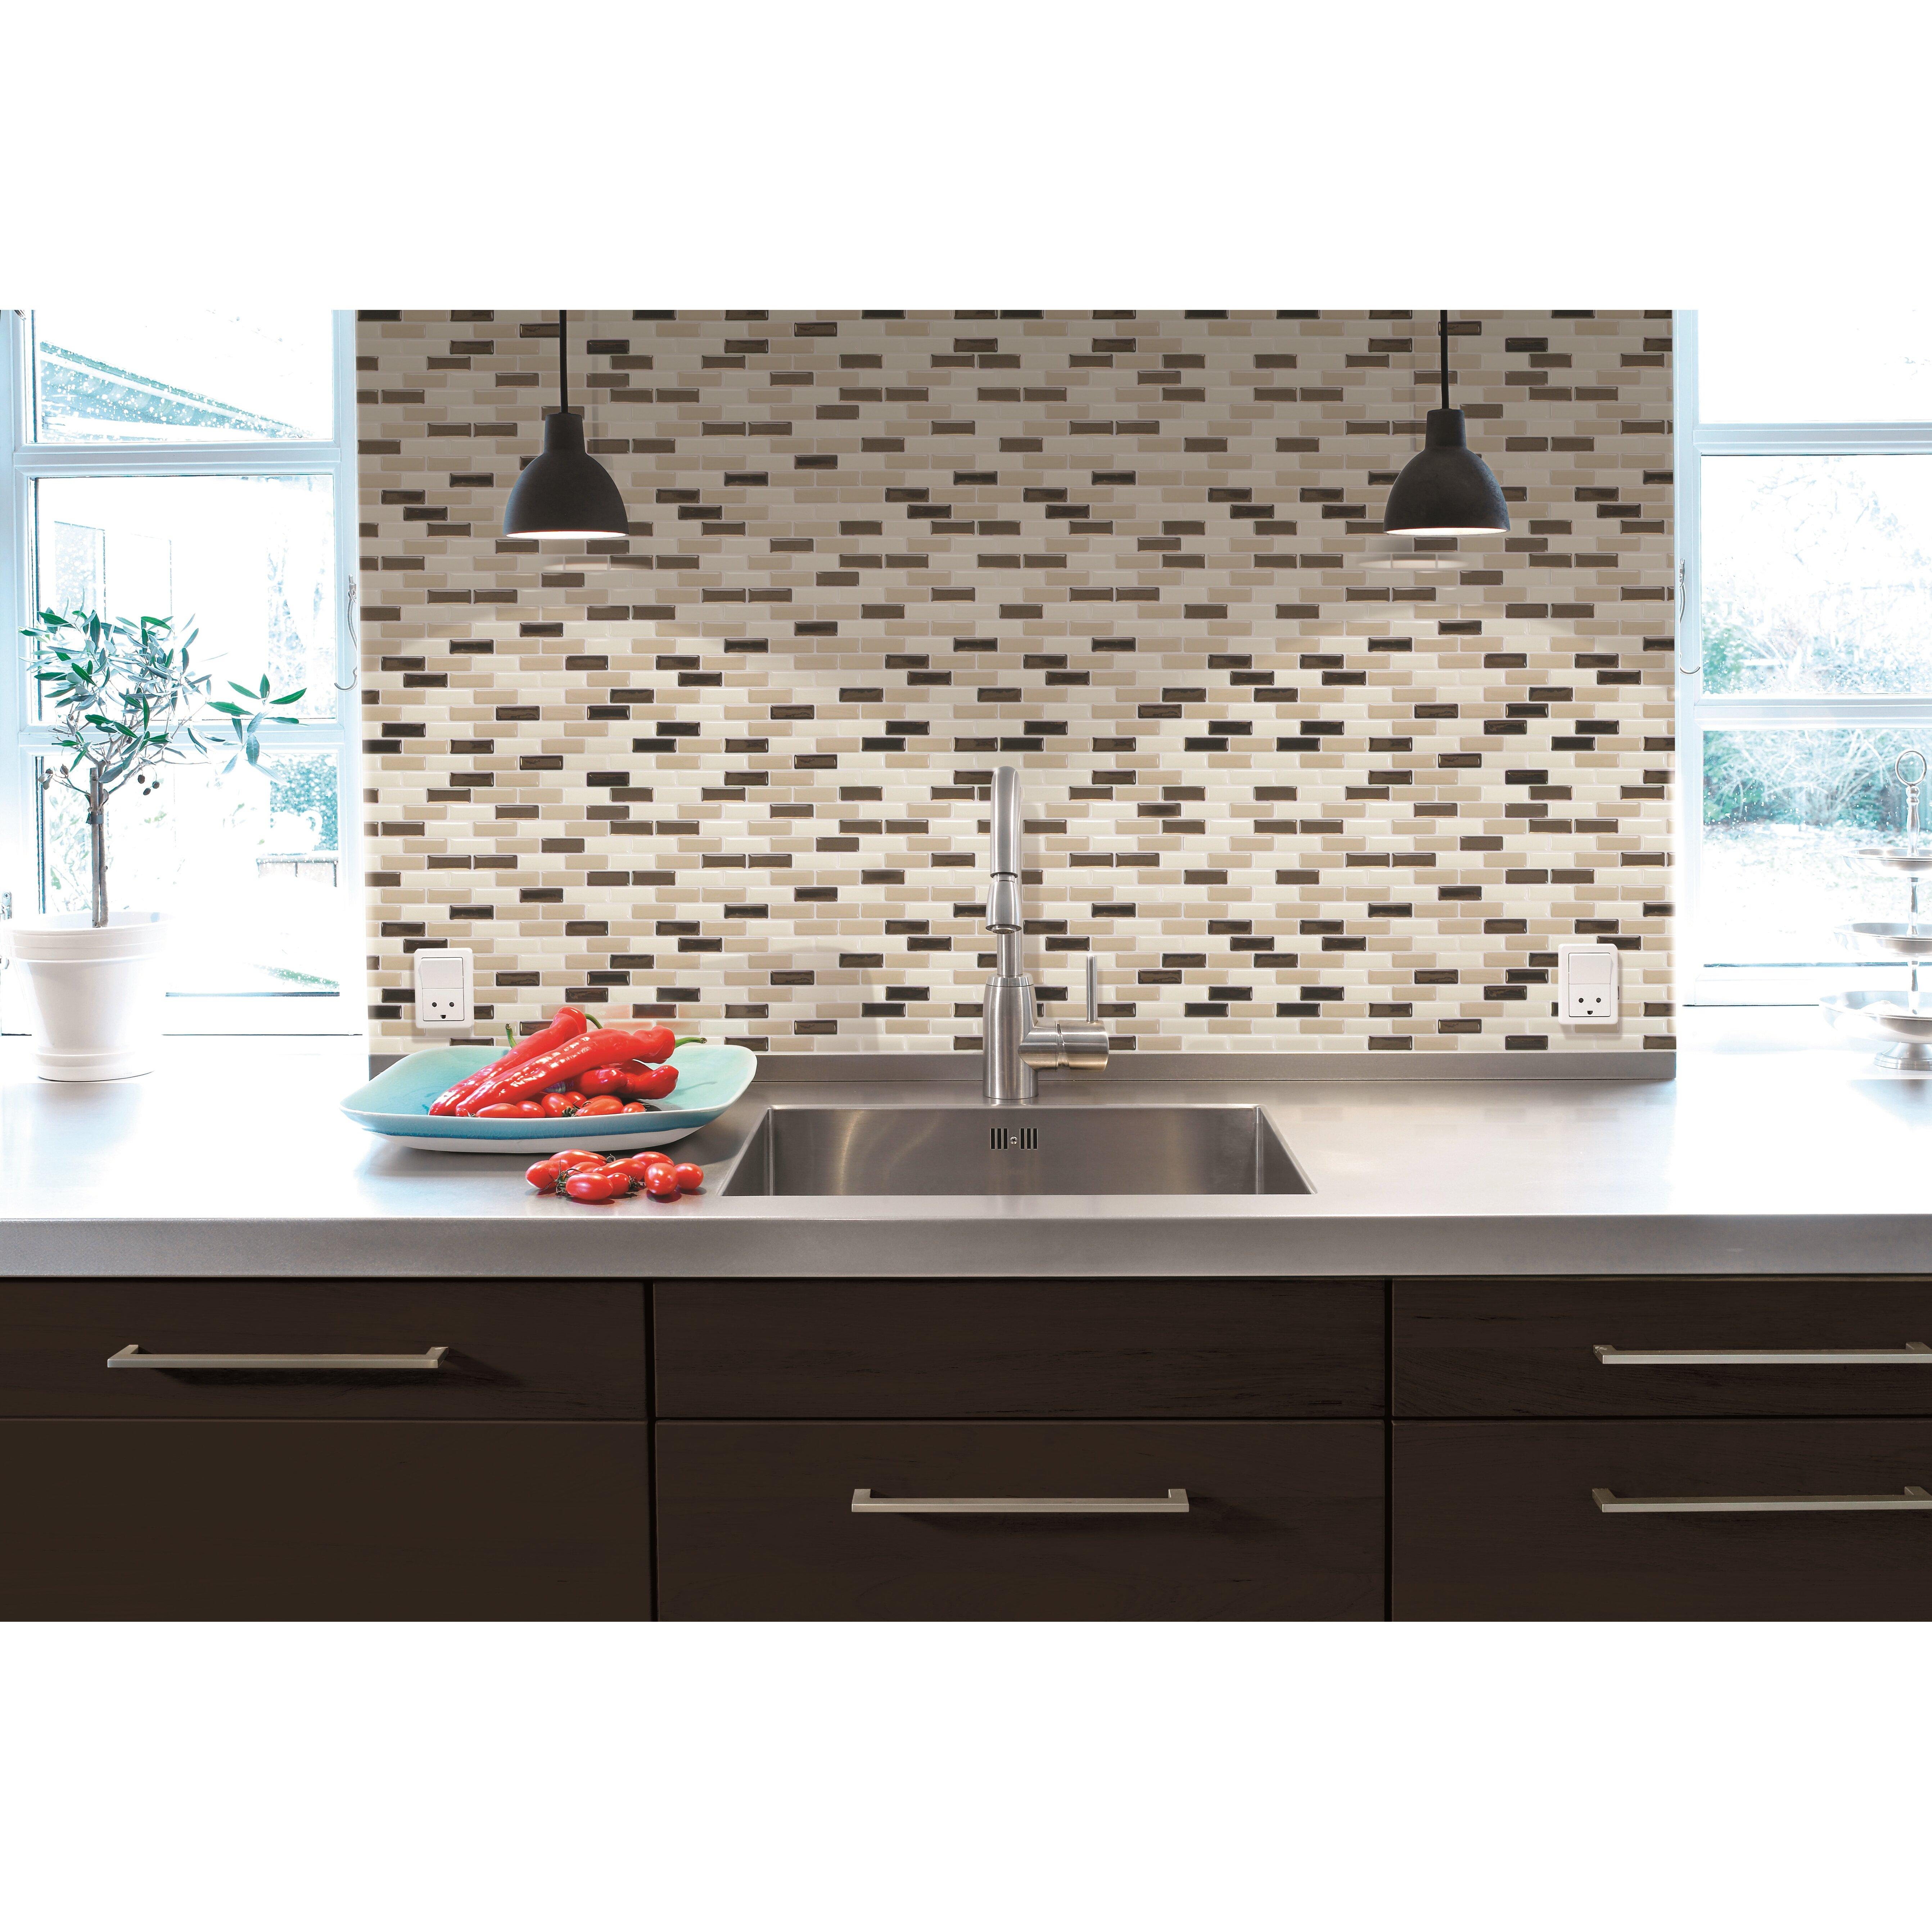 smart tiles mosaik murano dune x peel stick mosaic tile in bronze ivory beige. Black Bedroom Furniture Sets. Home Design Ideas